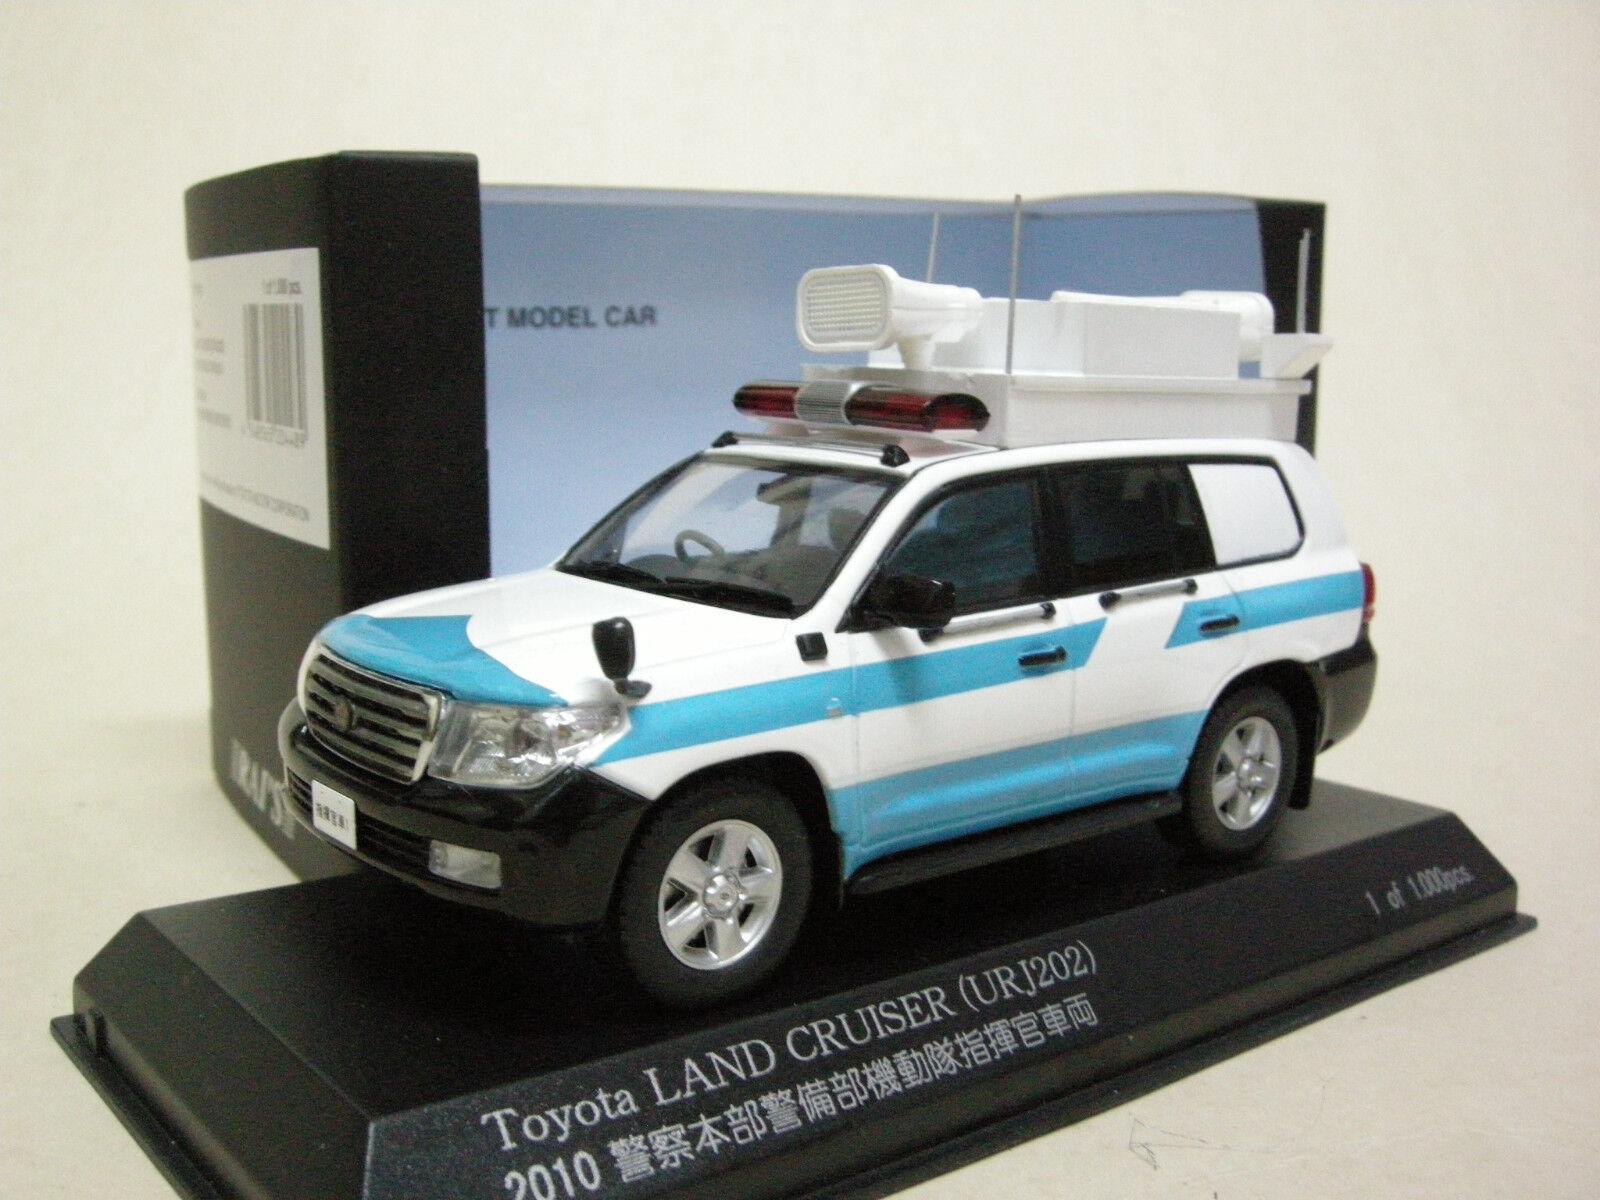 KYOSHO RAI'S TOYOTA LAND CRUISER URJ202 LEXUS LX570 Riot Police Command 1 43